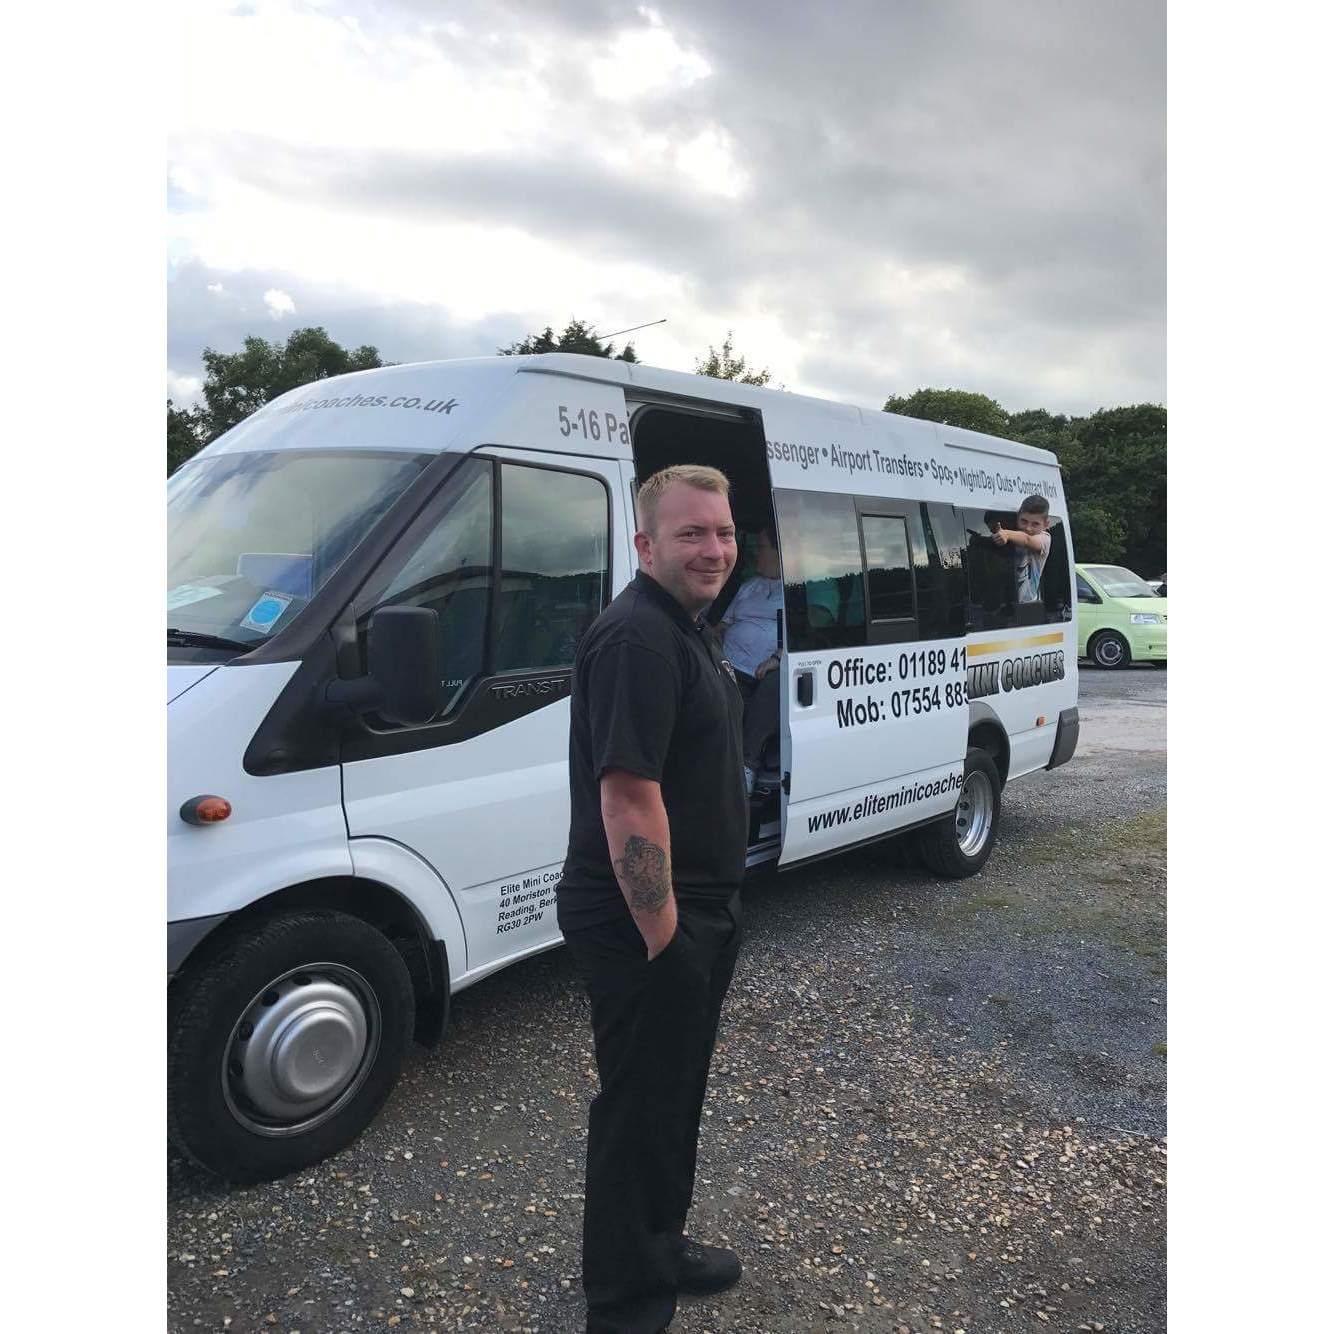 Elite Mini Coaches Ltd